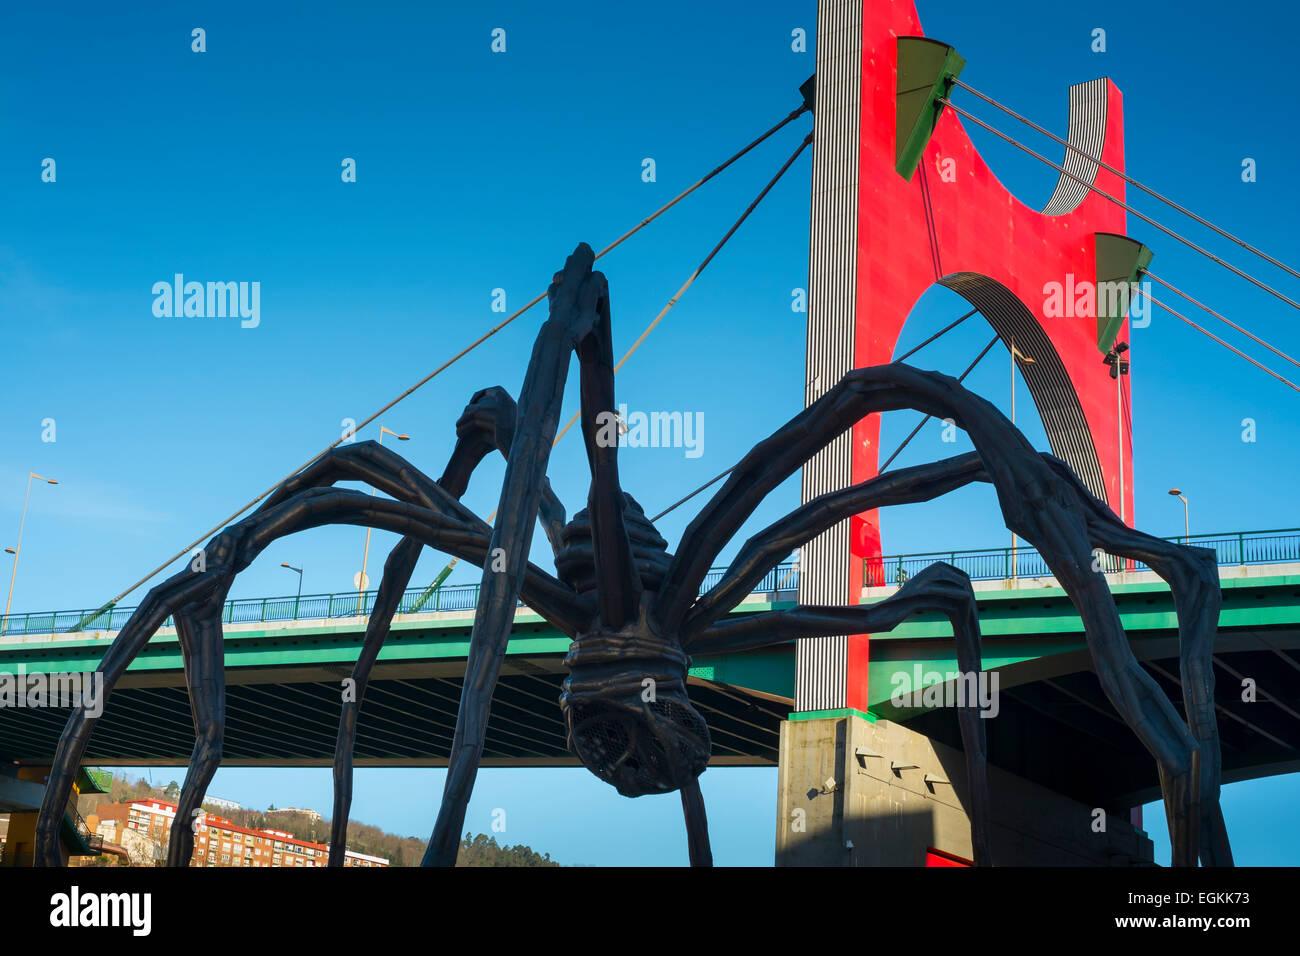 La Salve Bridge and 'Maman' spider sculpture. Bilbao, Spain. Europe. - Stock Image